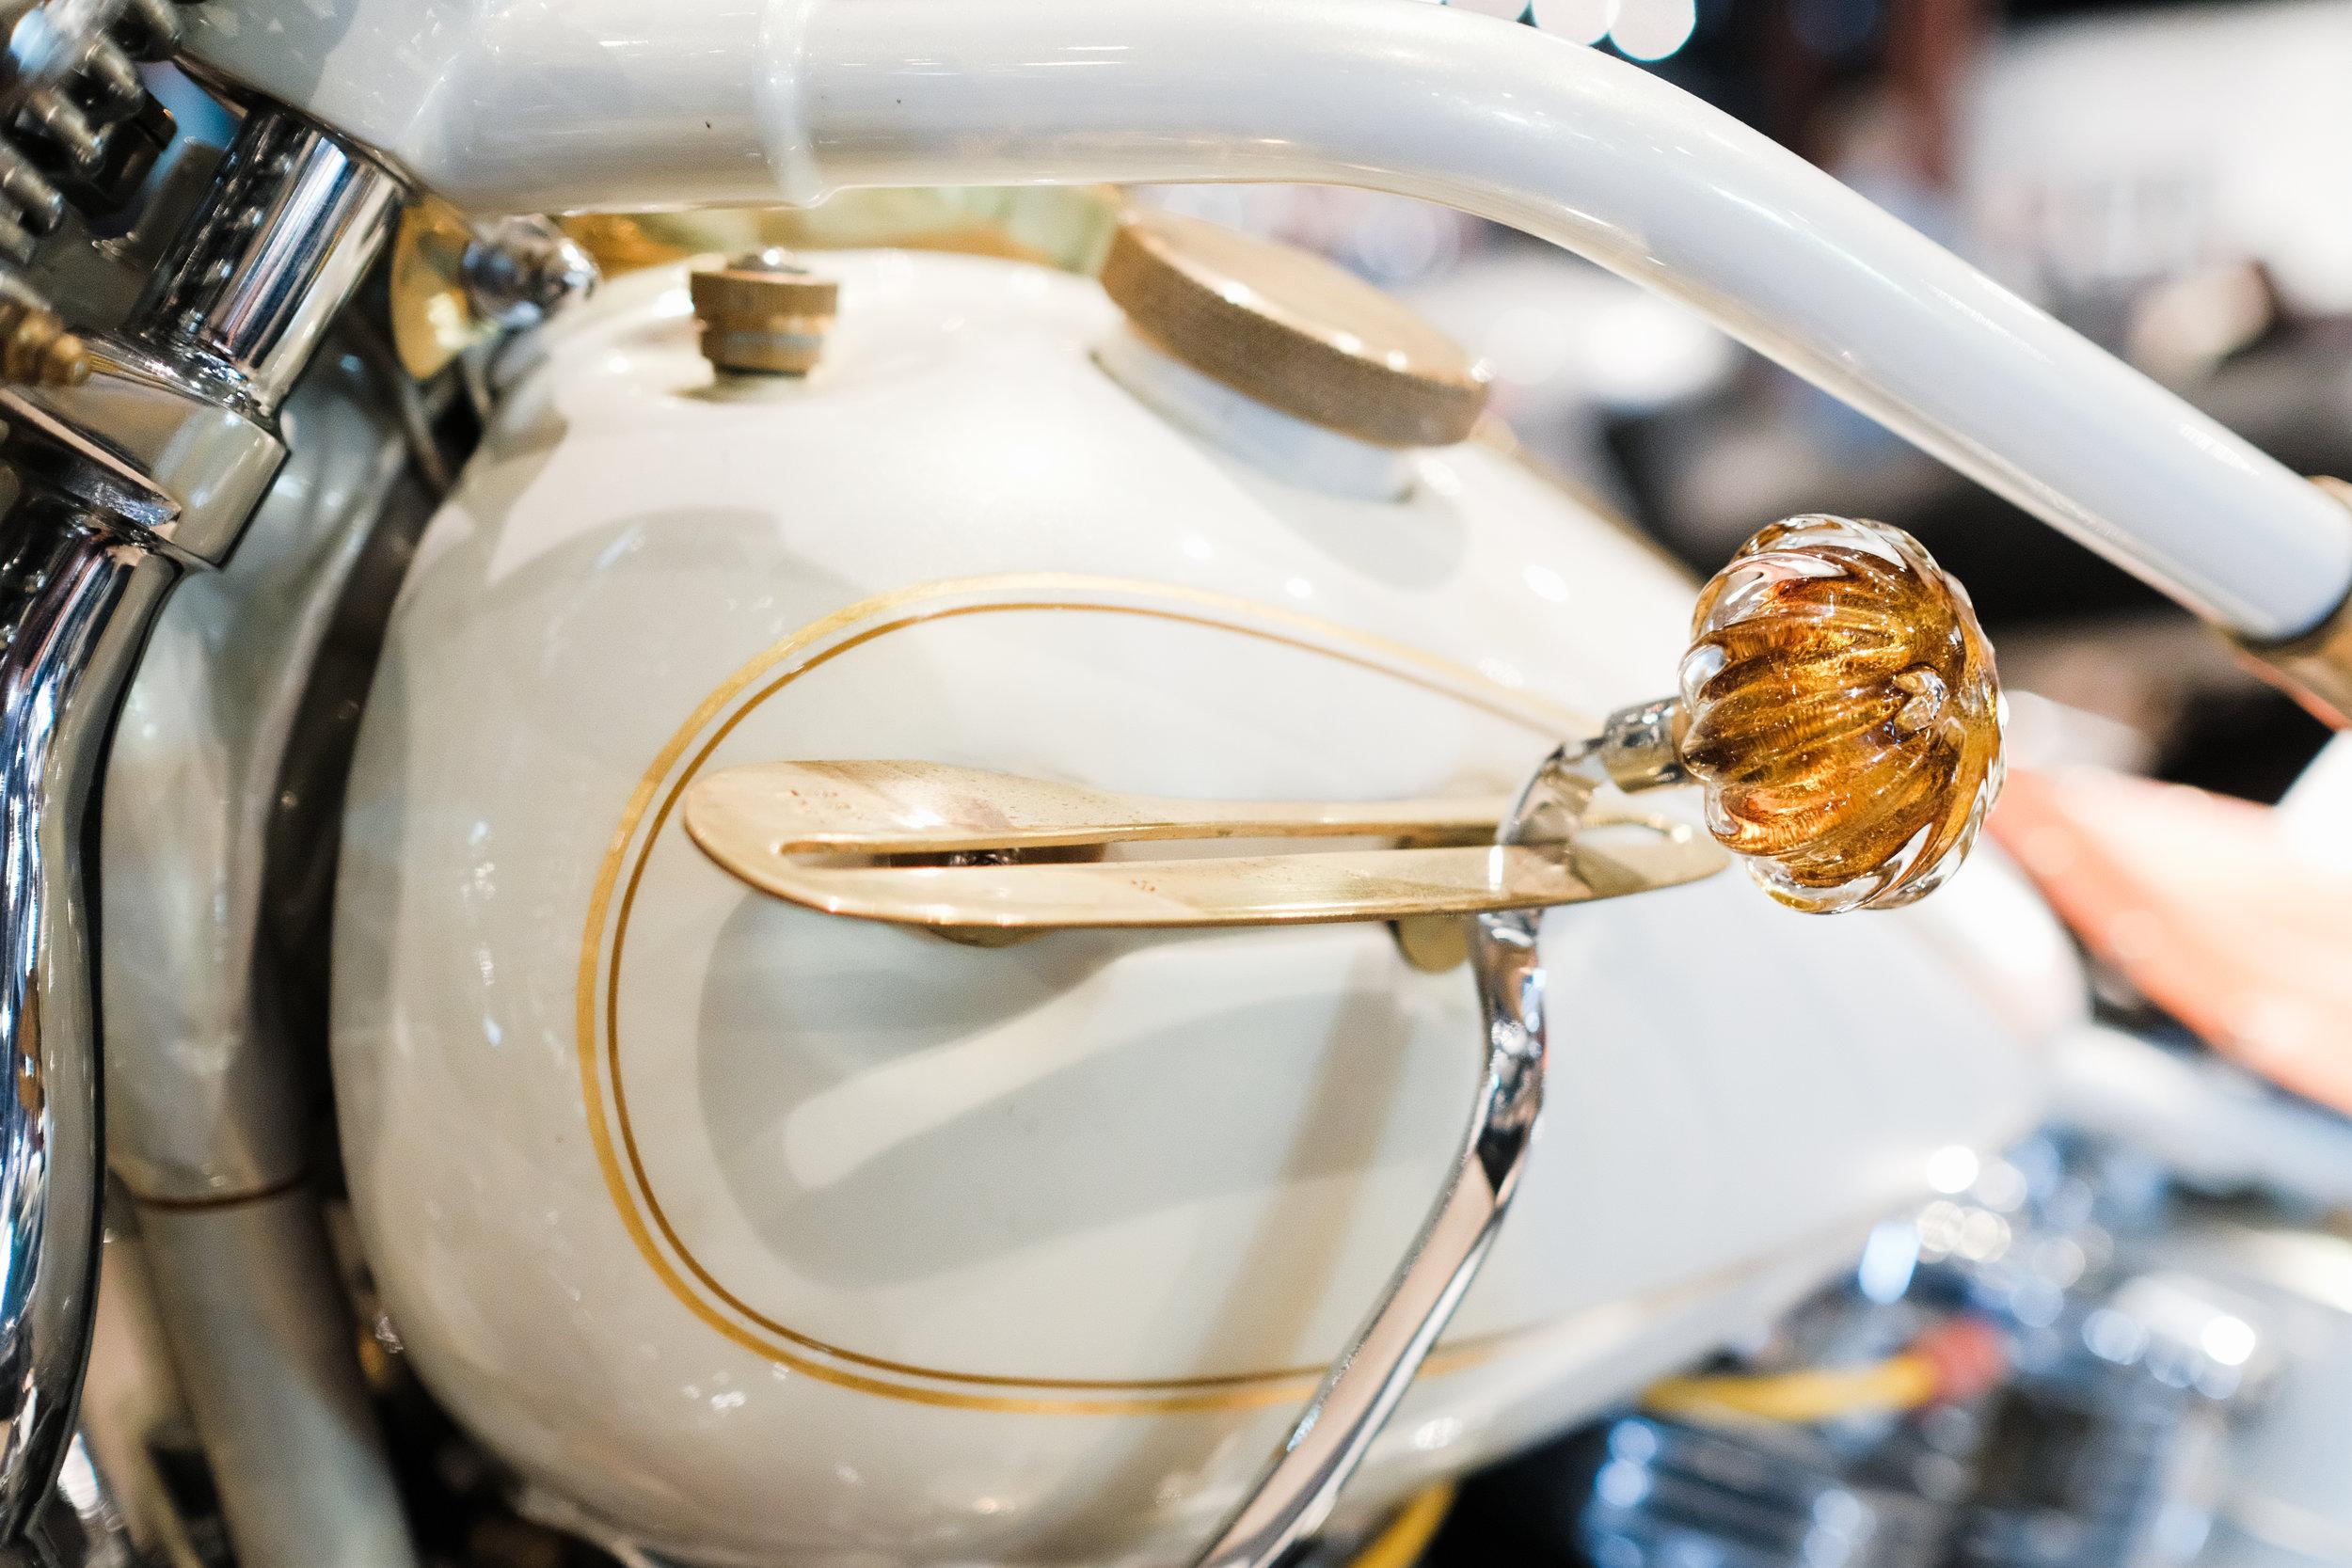 Handbuilt-Motorcycle-Show-2017-8731.jpg